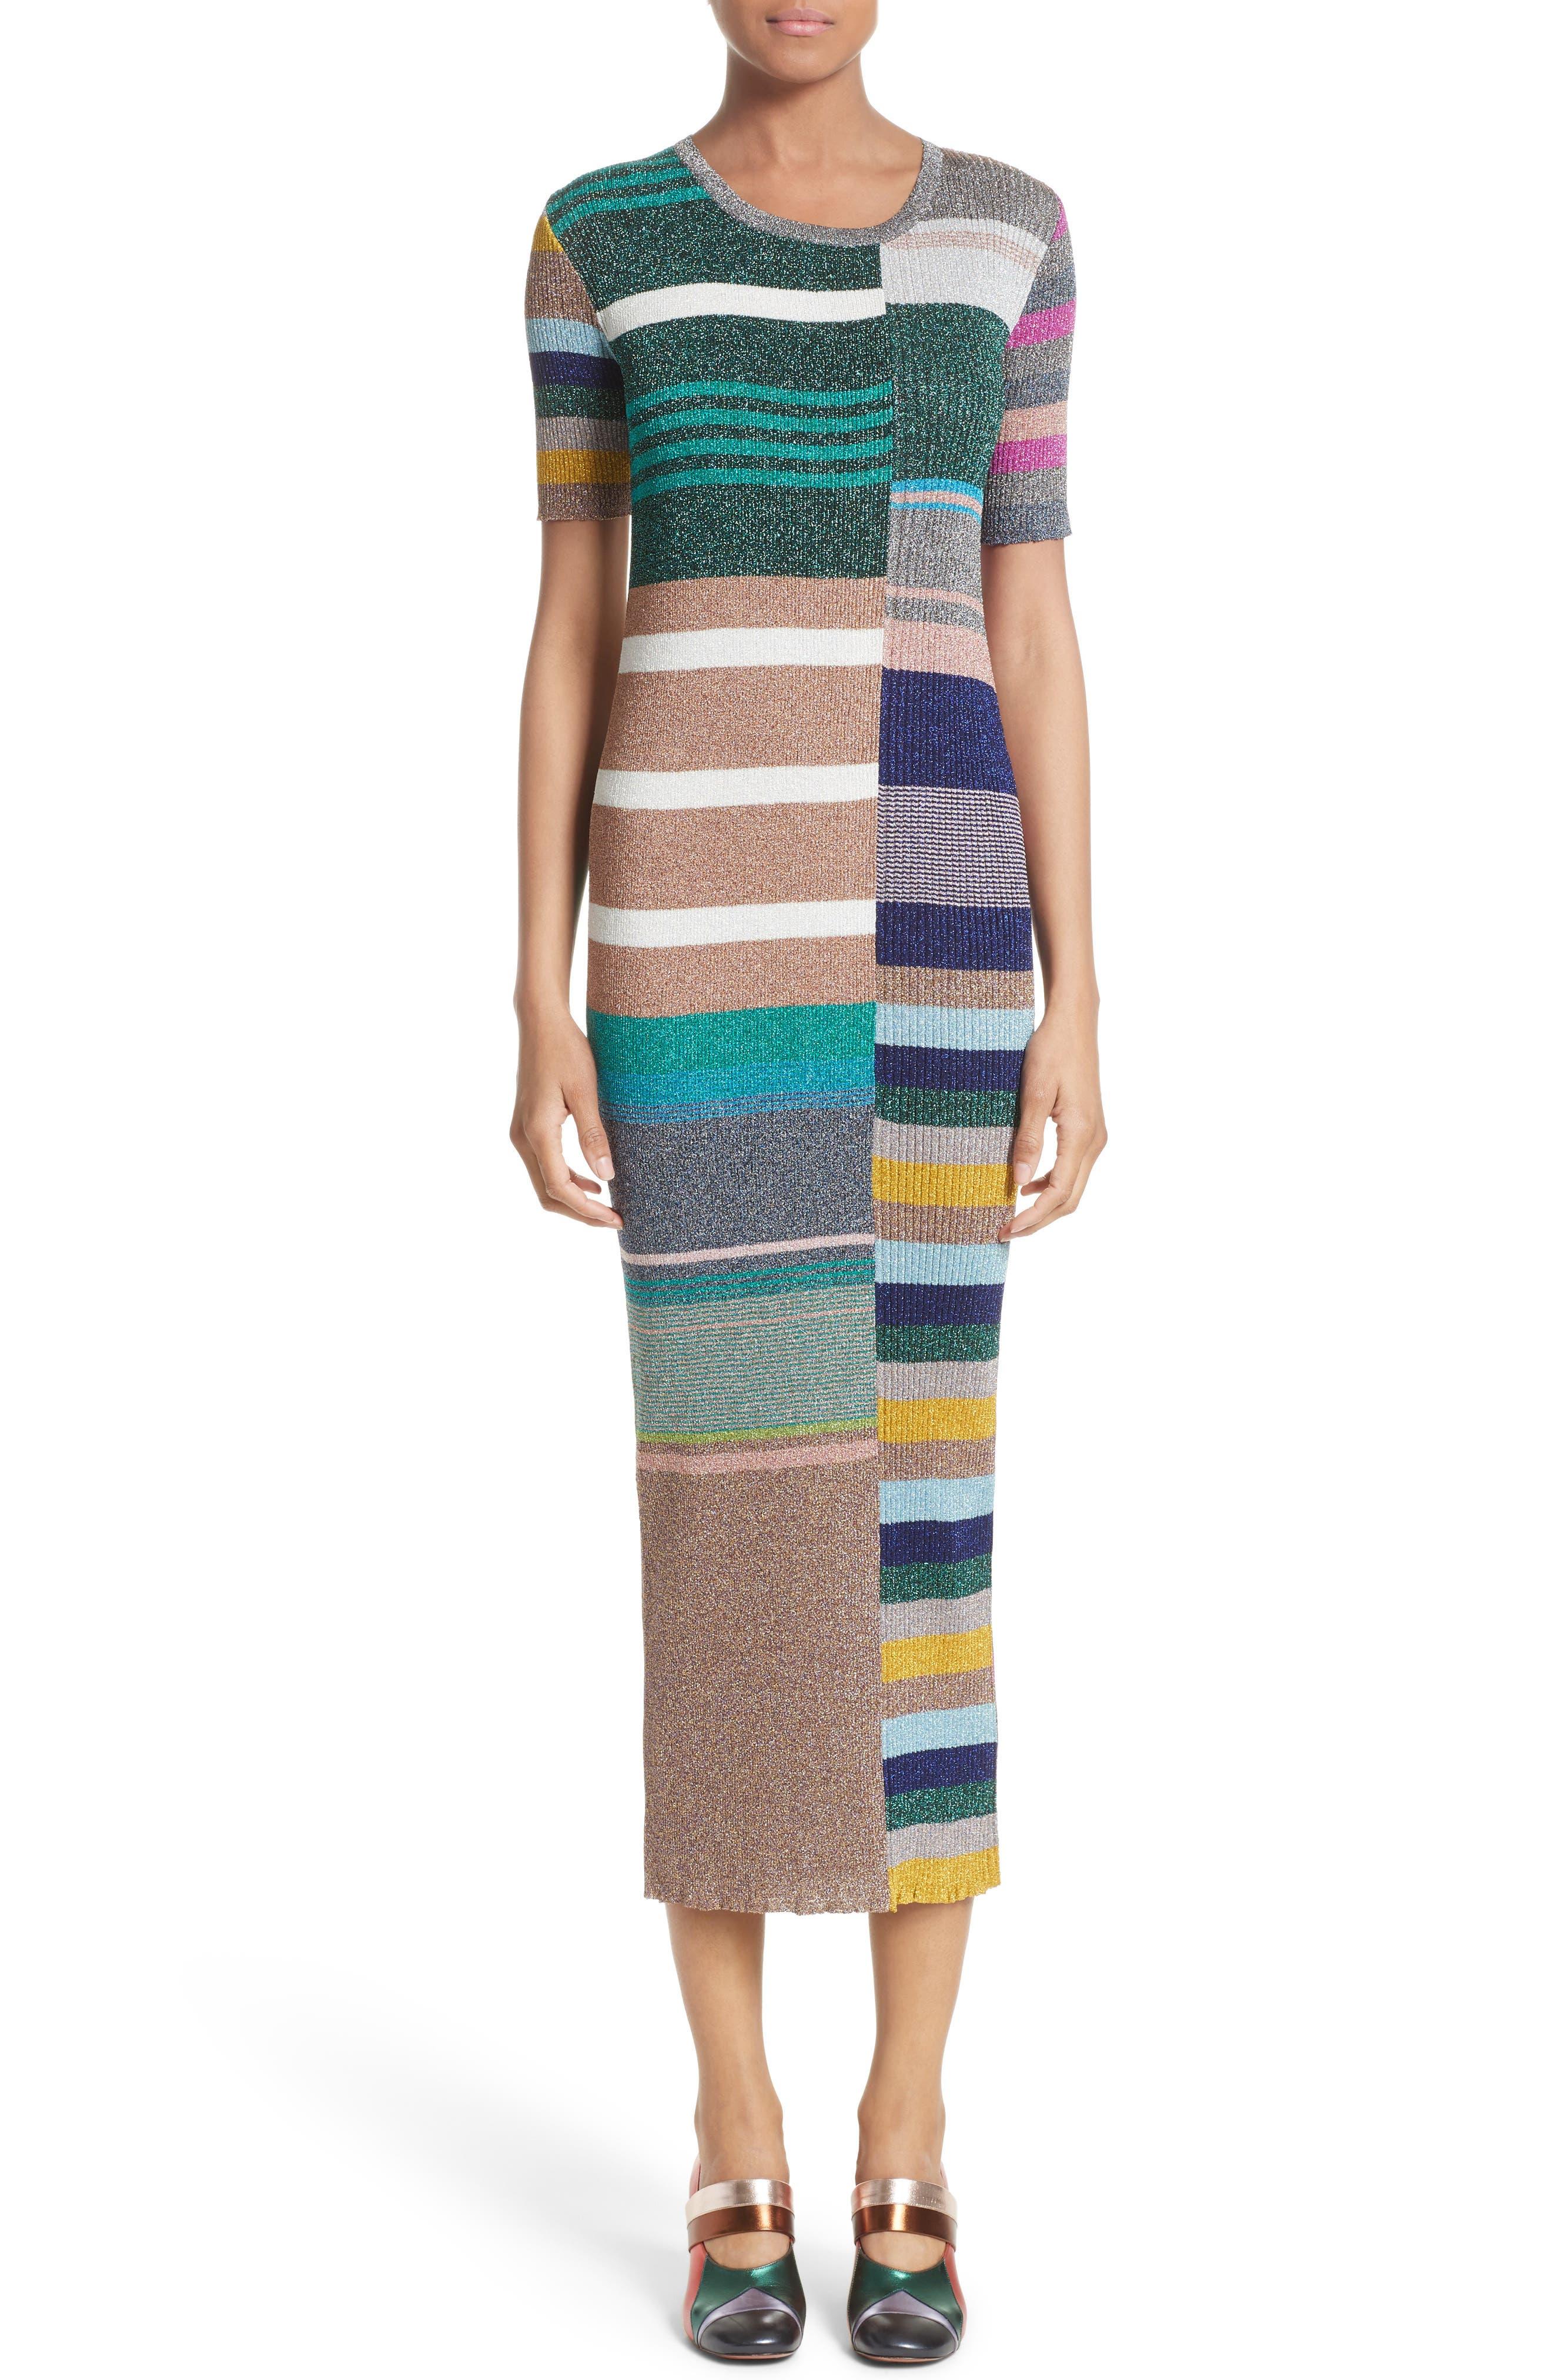 Alternate Image 1 Selected - Missoni Metallic Stripe Rib Knit Dress